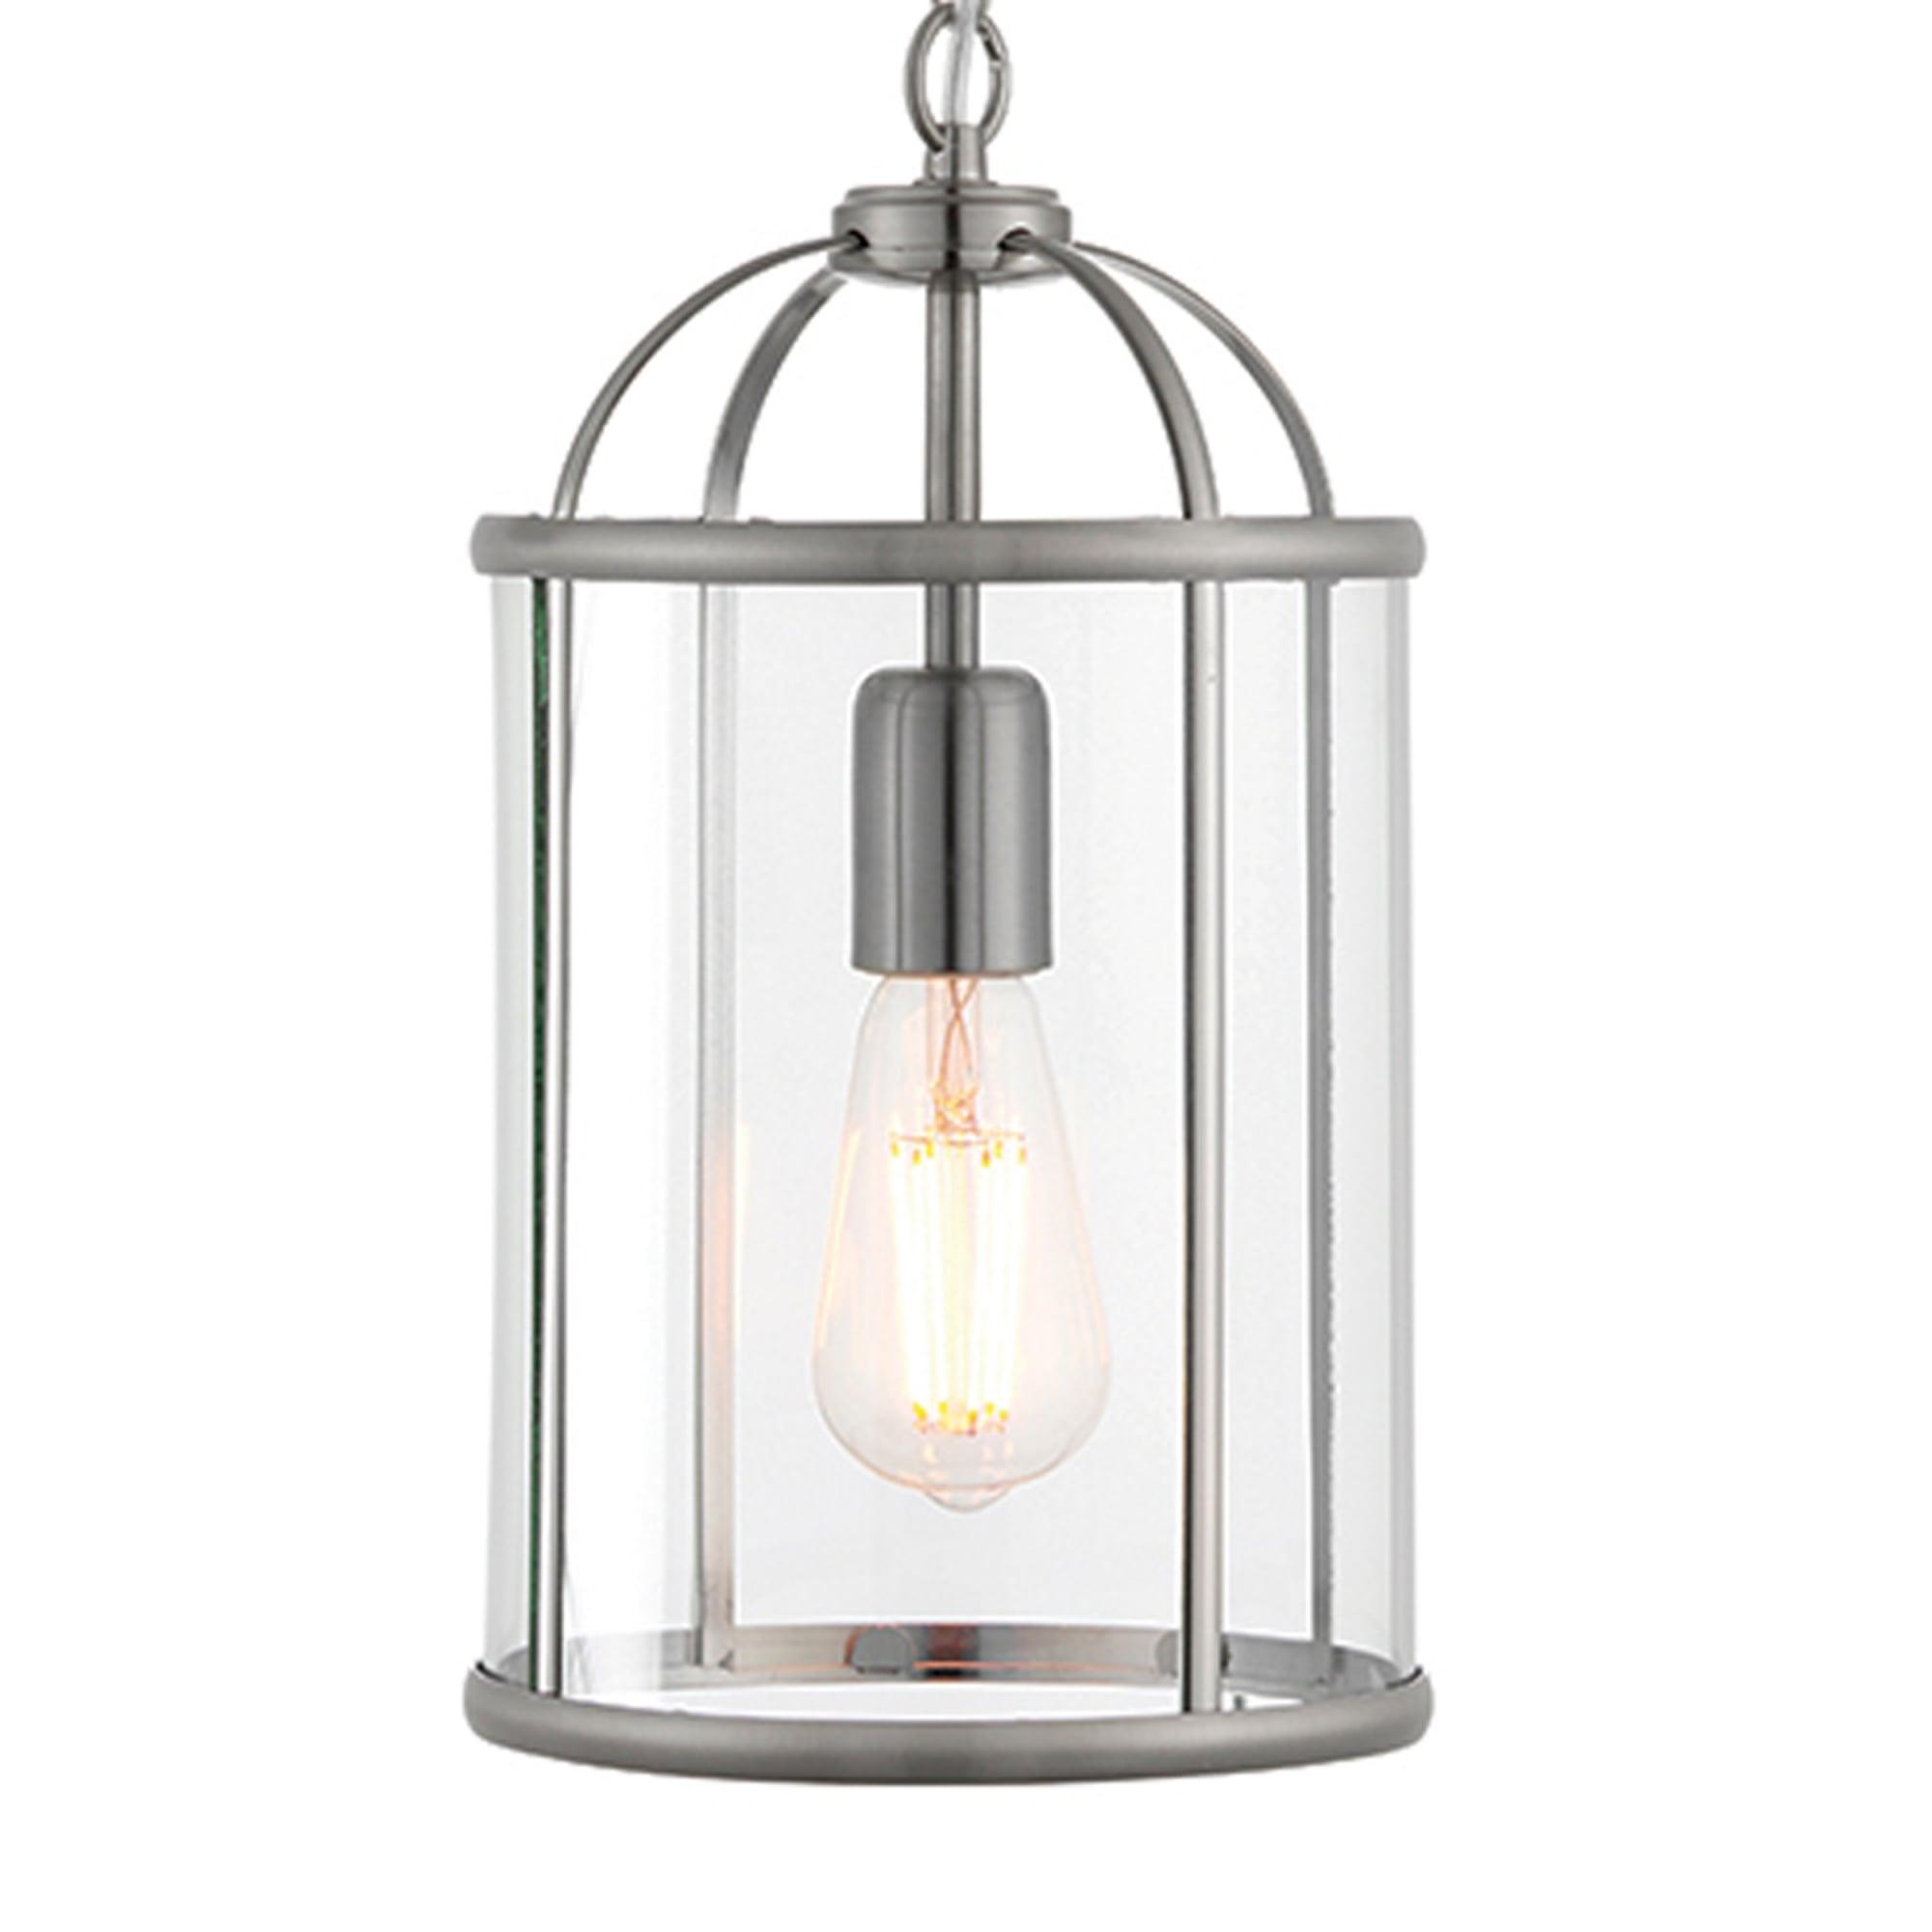 Endon 70323 Lambeth 1 Light Satin Nickel And Glass Lantern Pendant